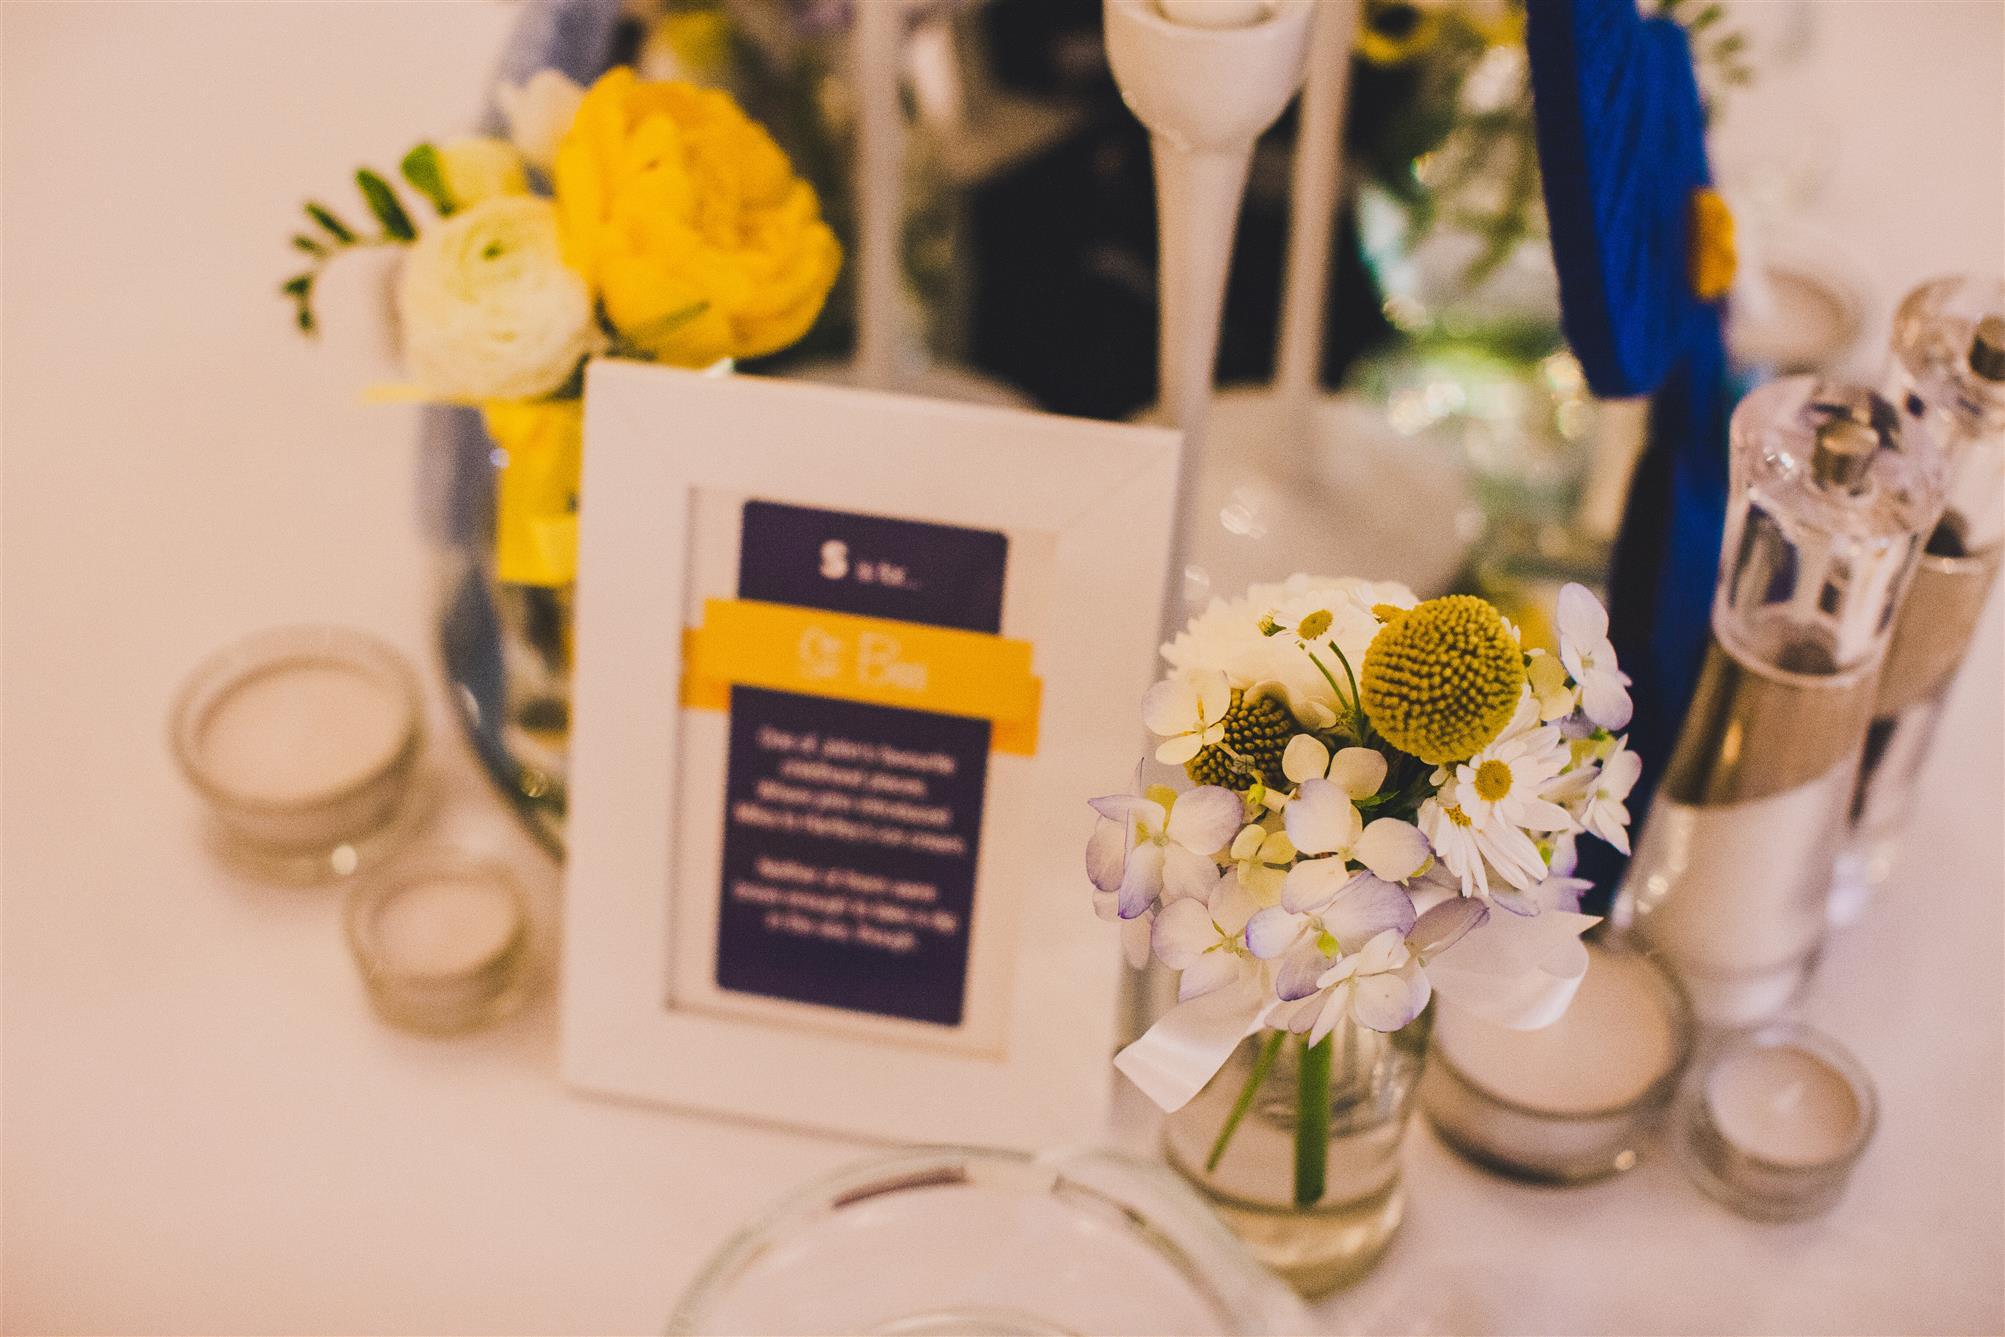 Reception Decor - A Spring 1960s Inspired Wedding